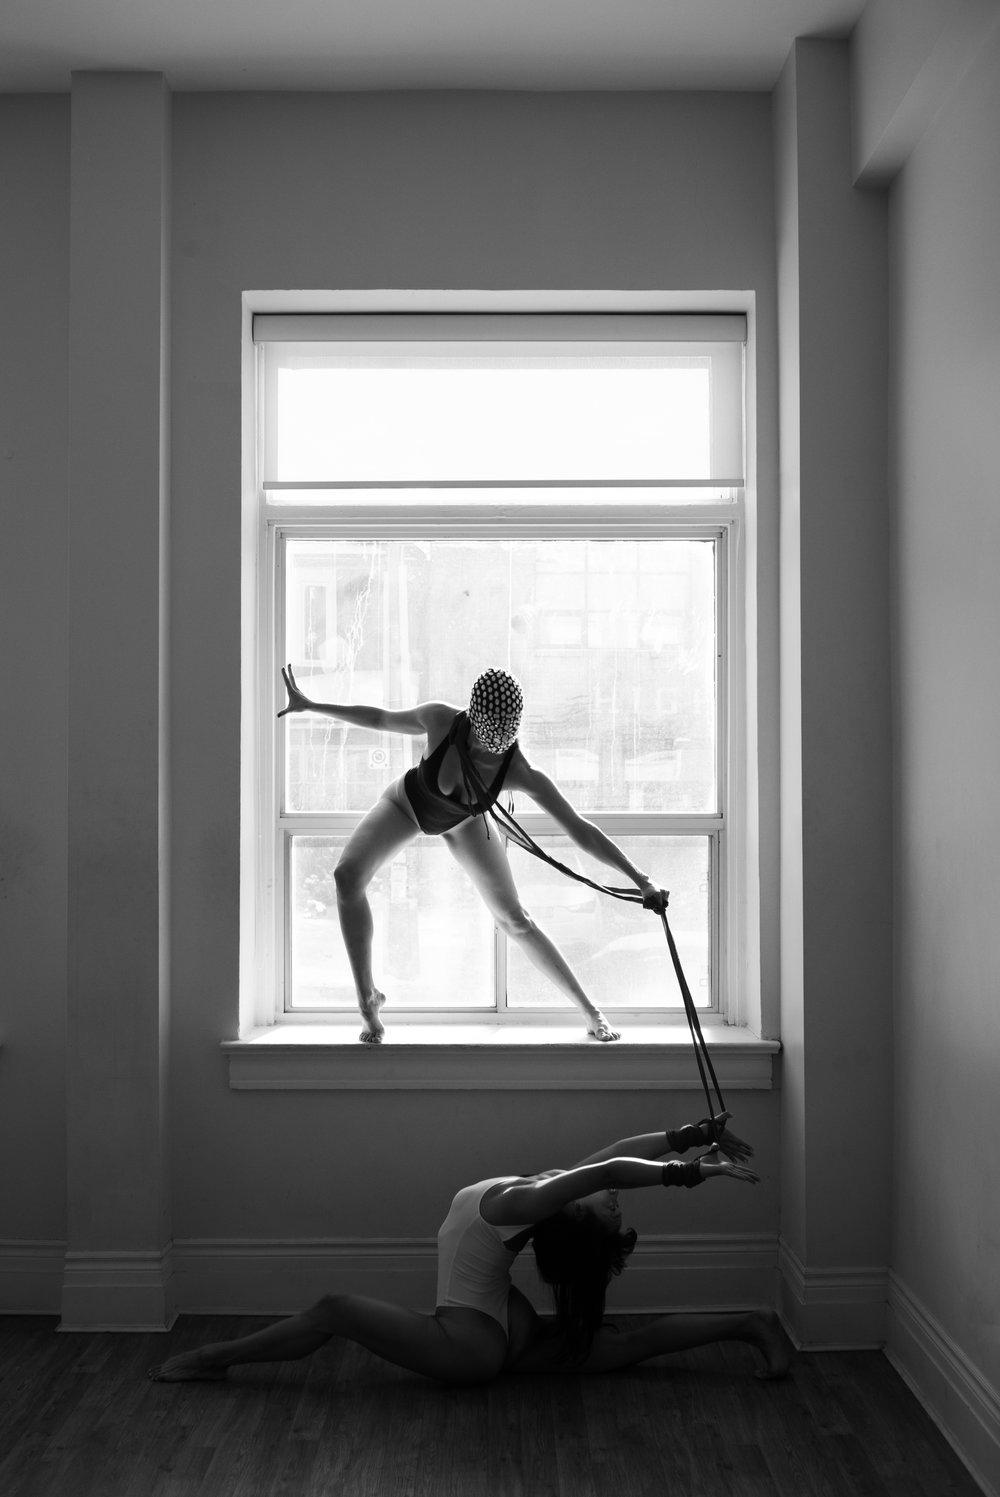 Photographer: Justin Robinson